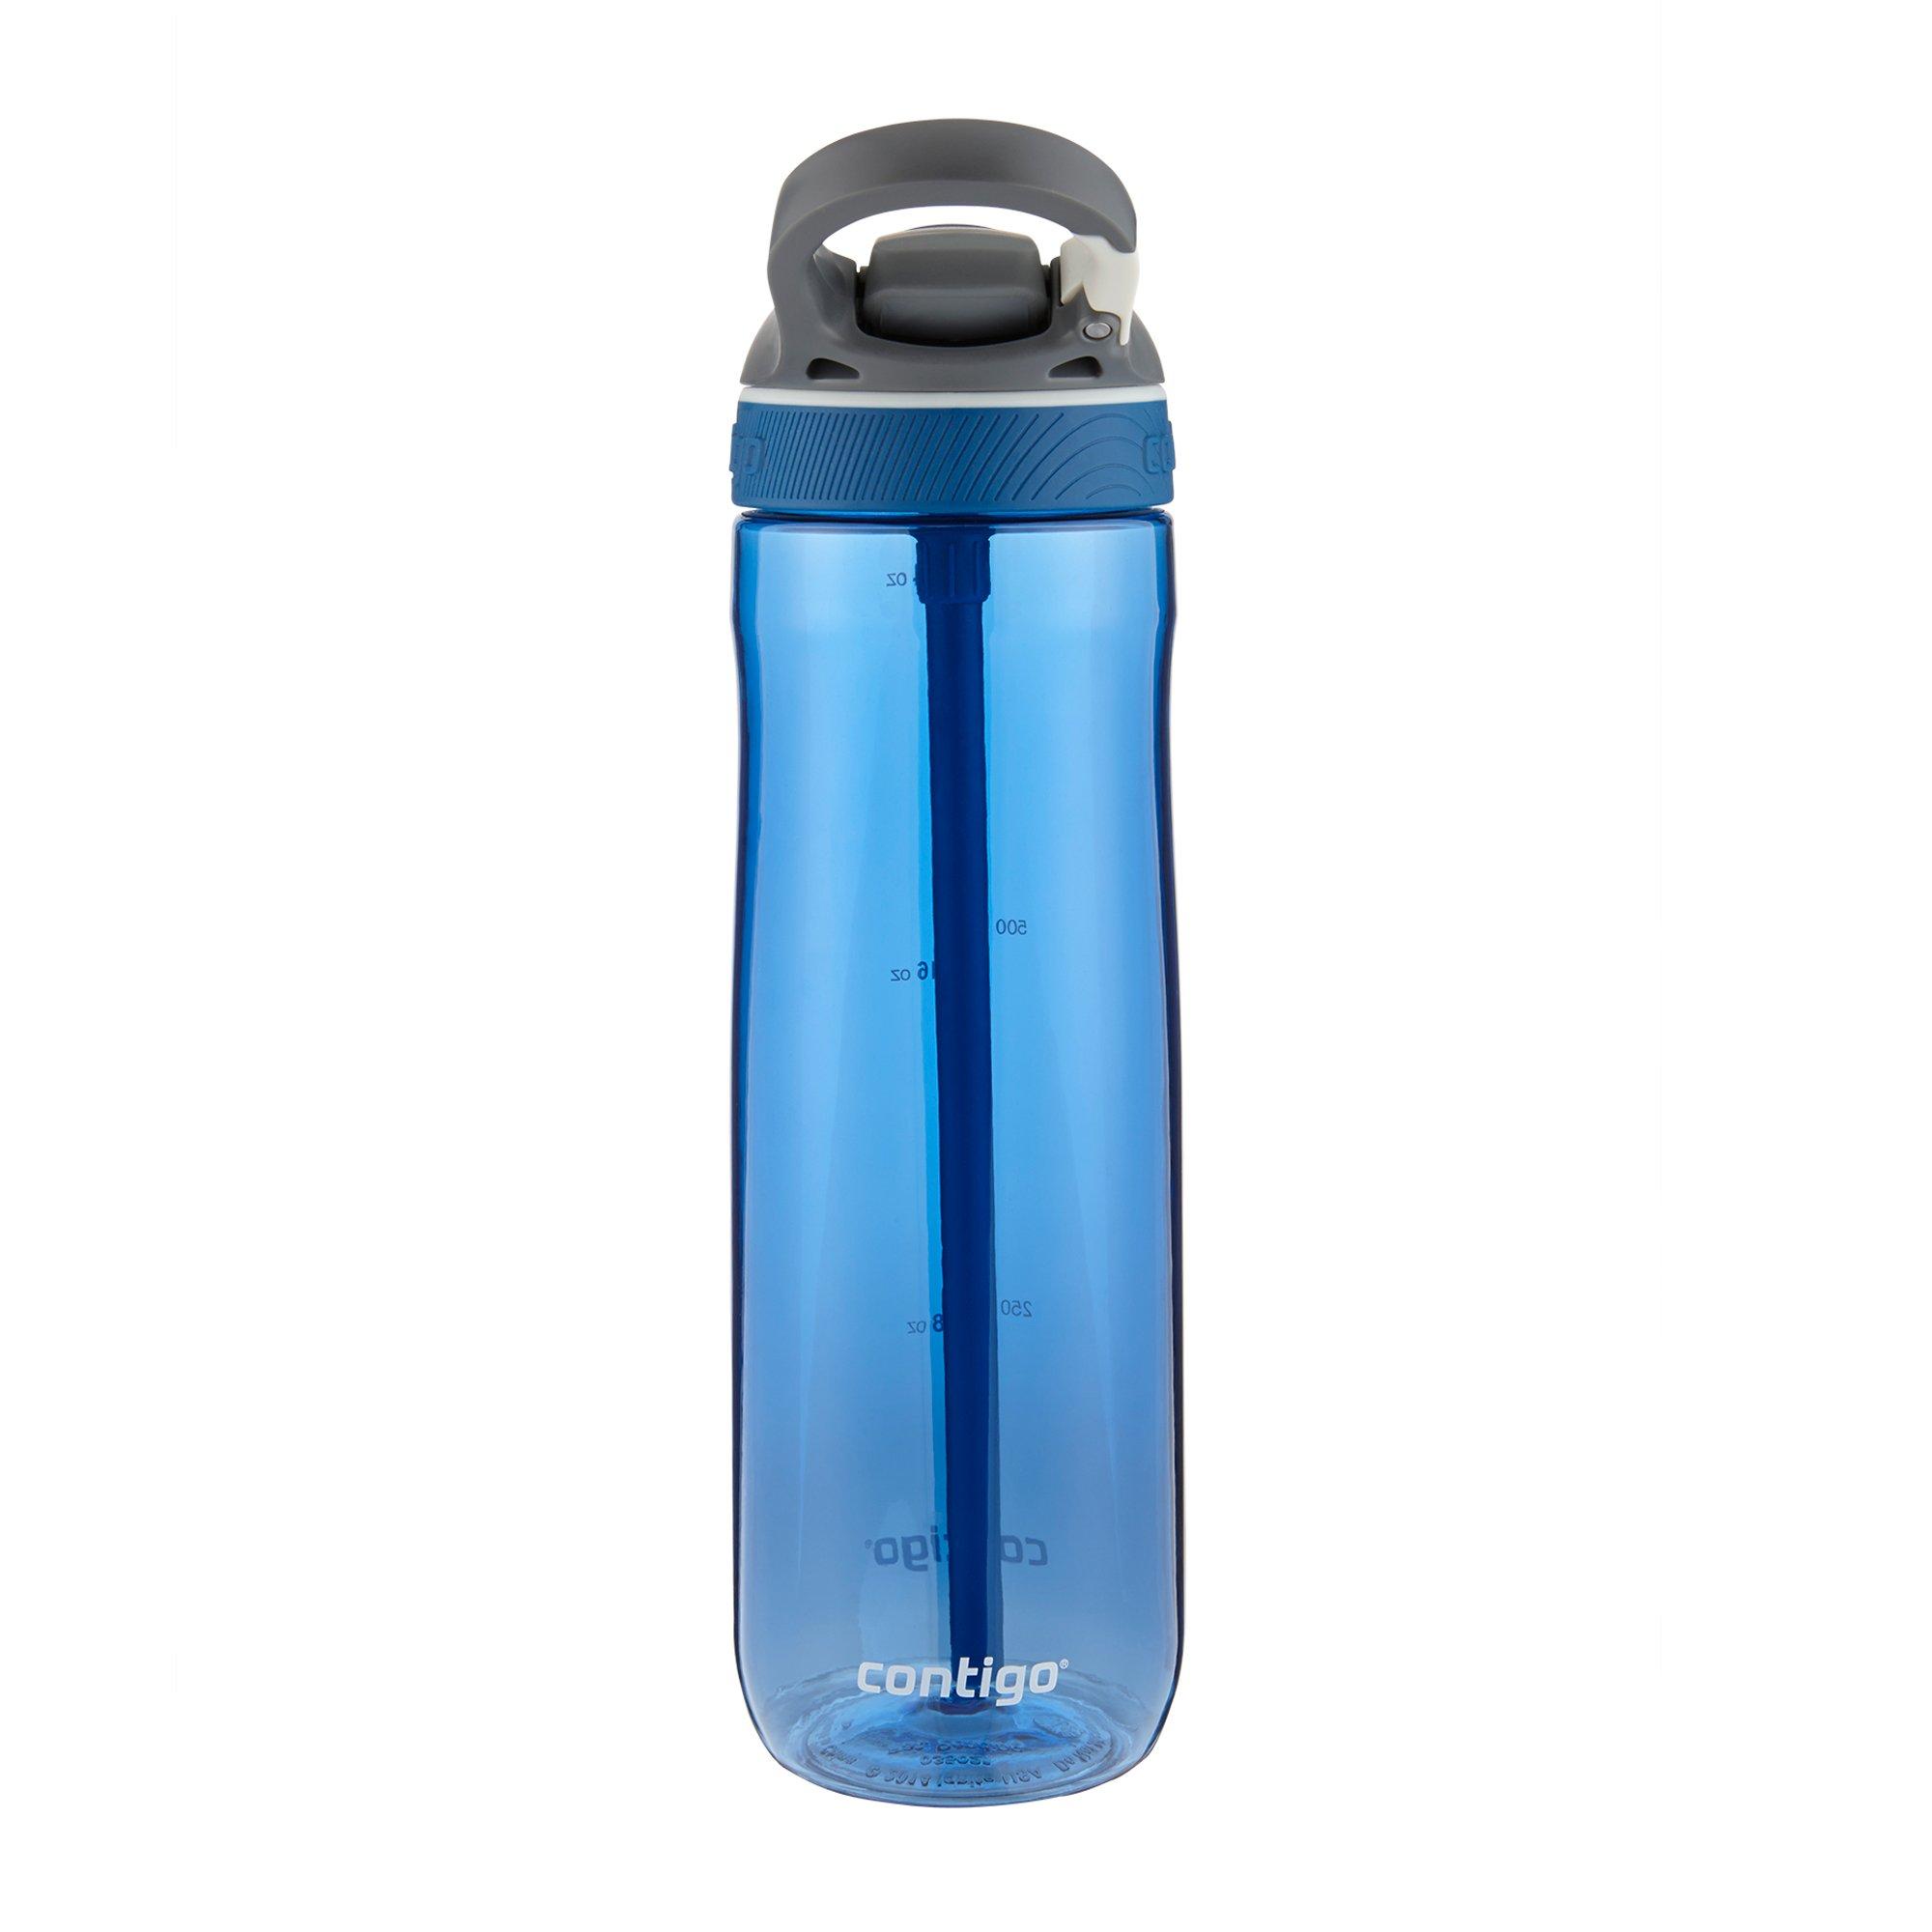 Contigo AUTOSPOUT Straw Ashland Water Bottle, 24 oz, Stormy Weather/Vibrant Lime/Monaco, 3-pack by Contigo (Image #5)